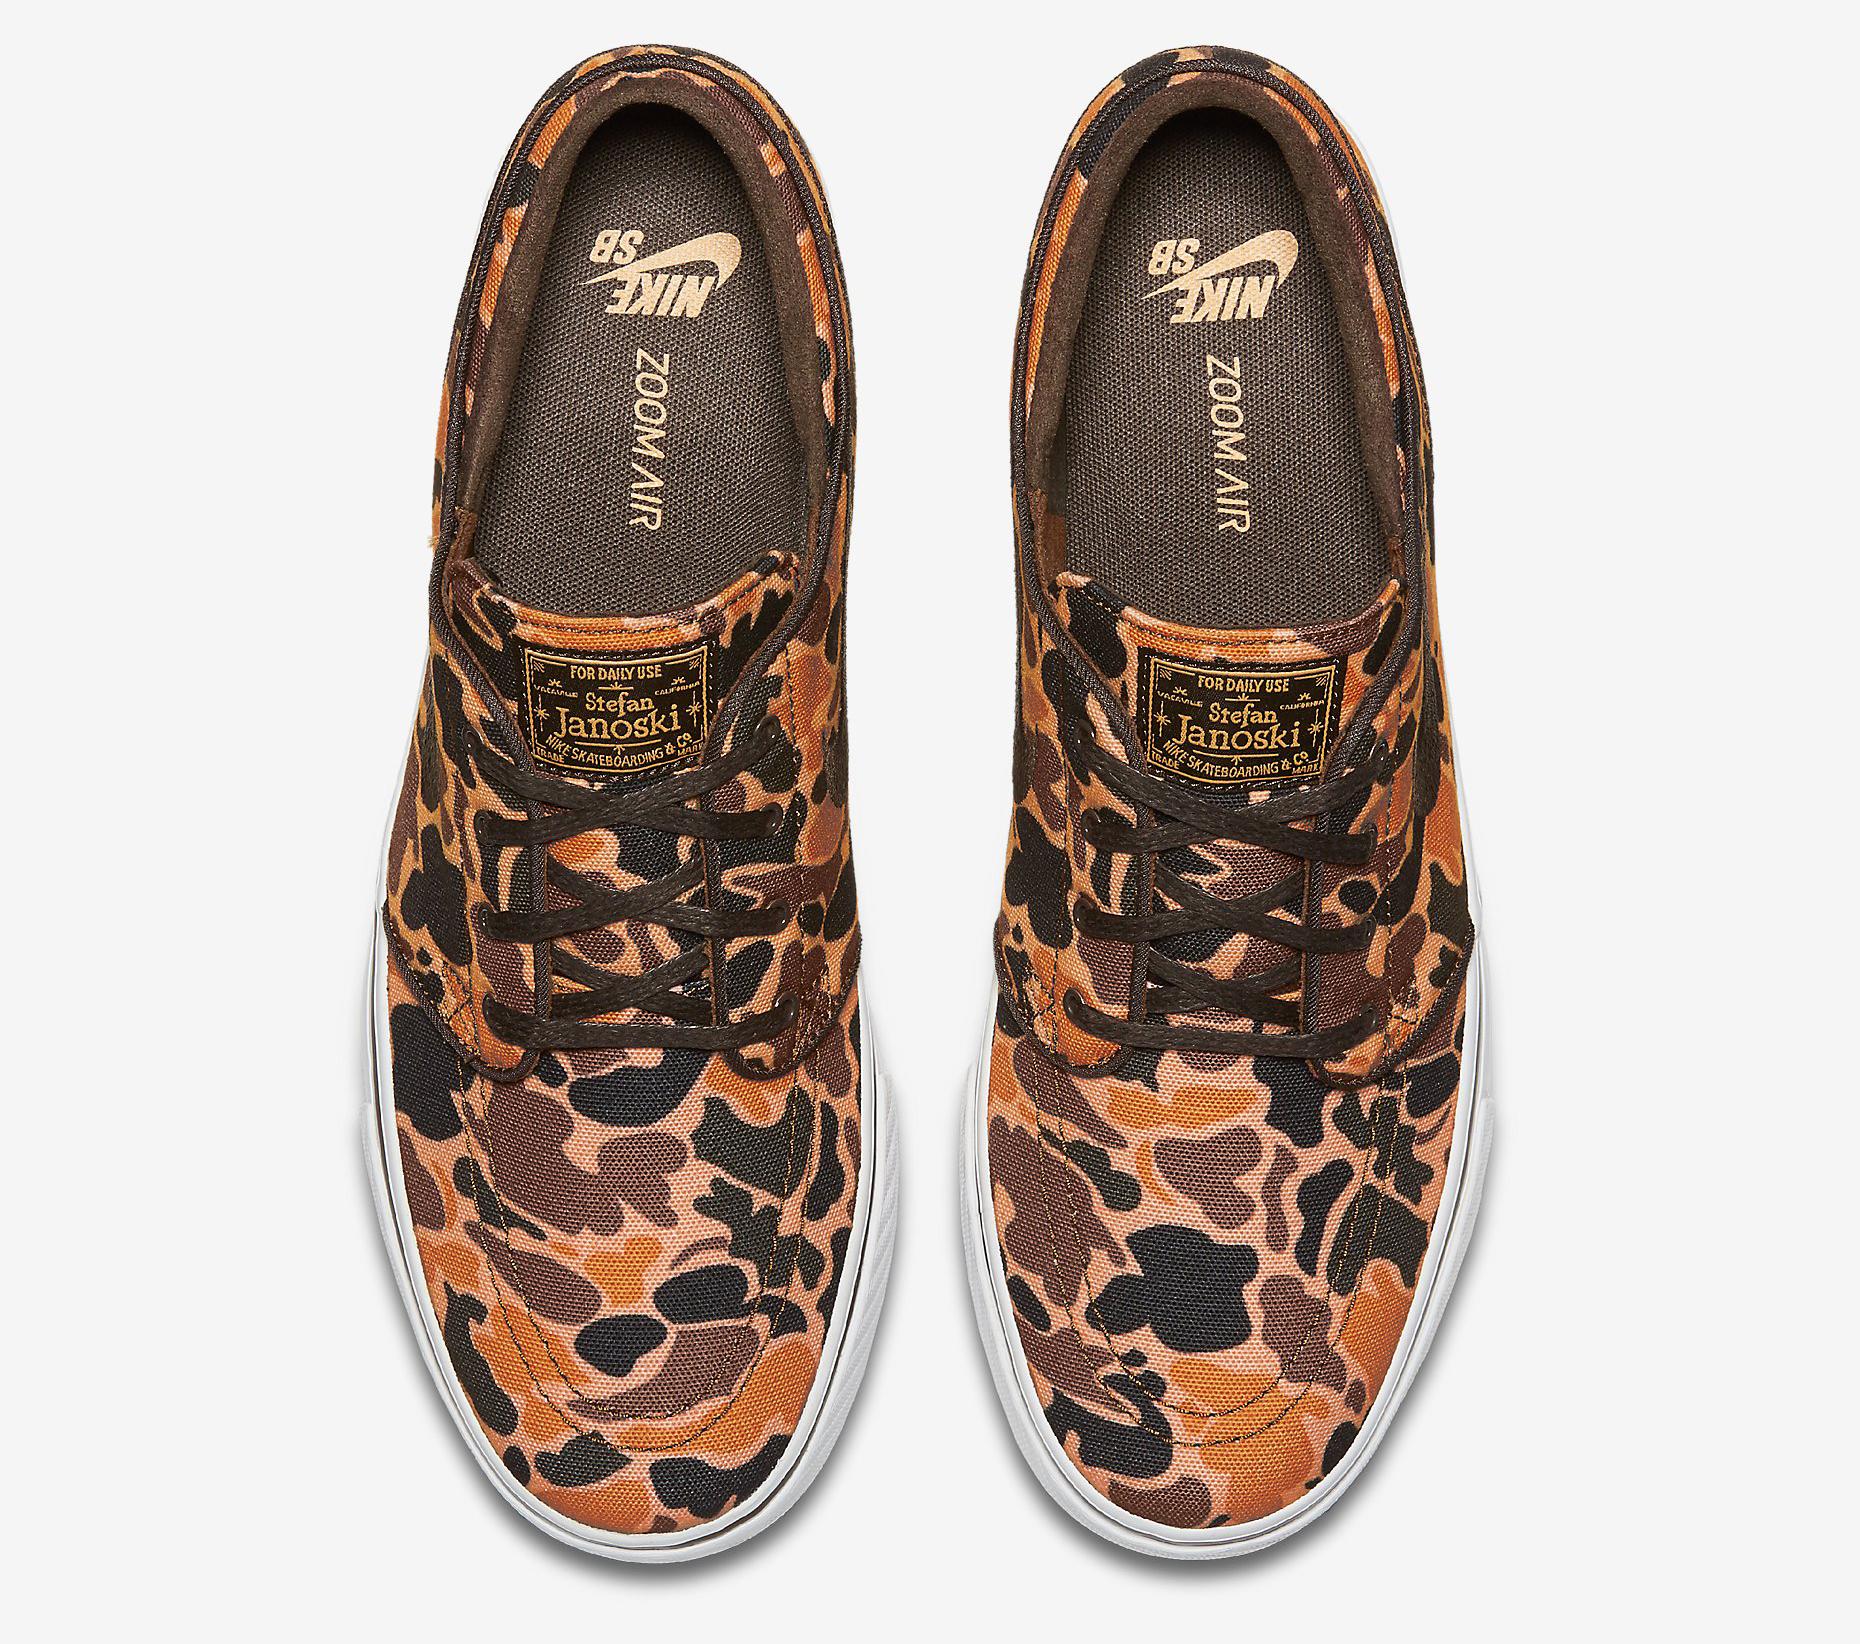 Camouflage Nike SB Janoski Top